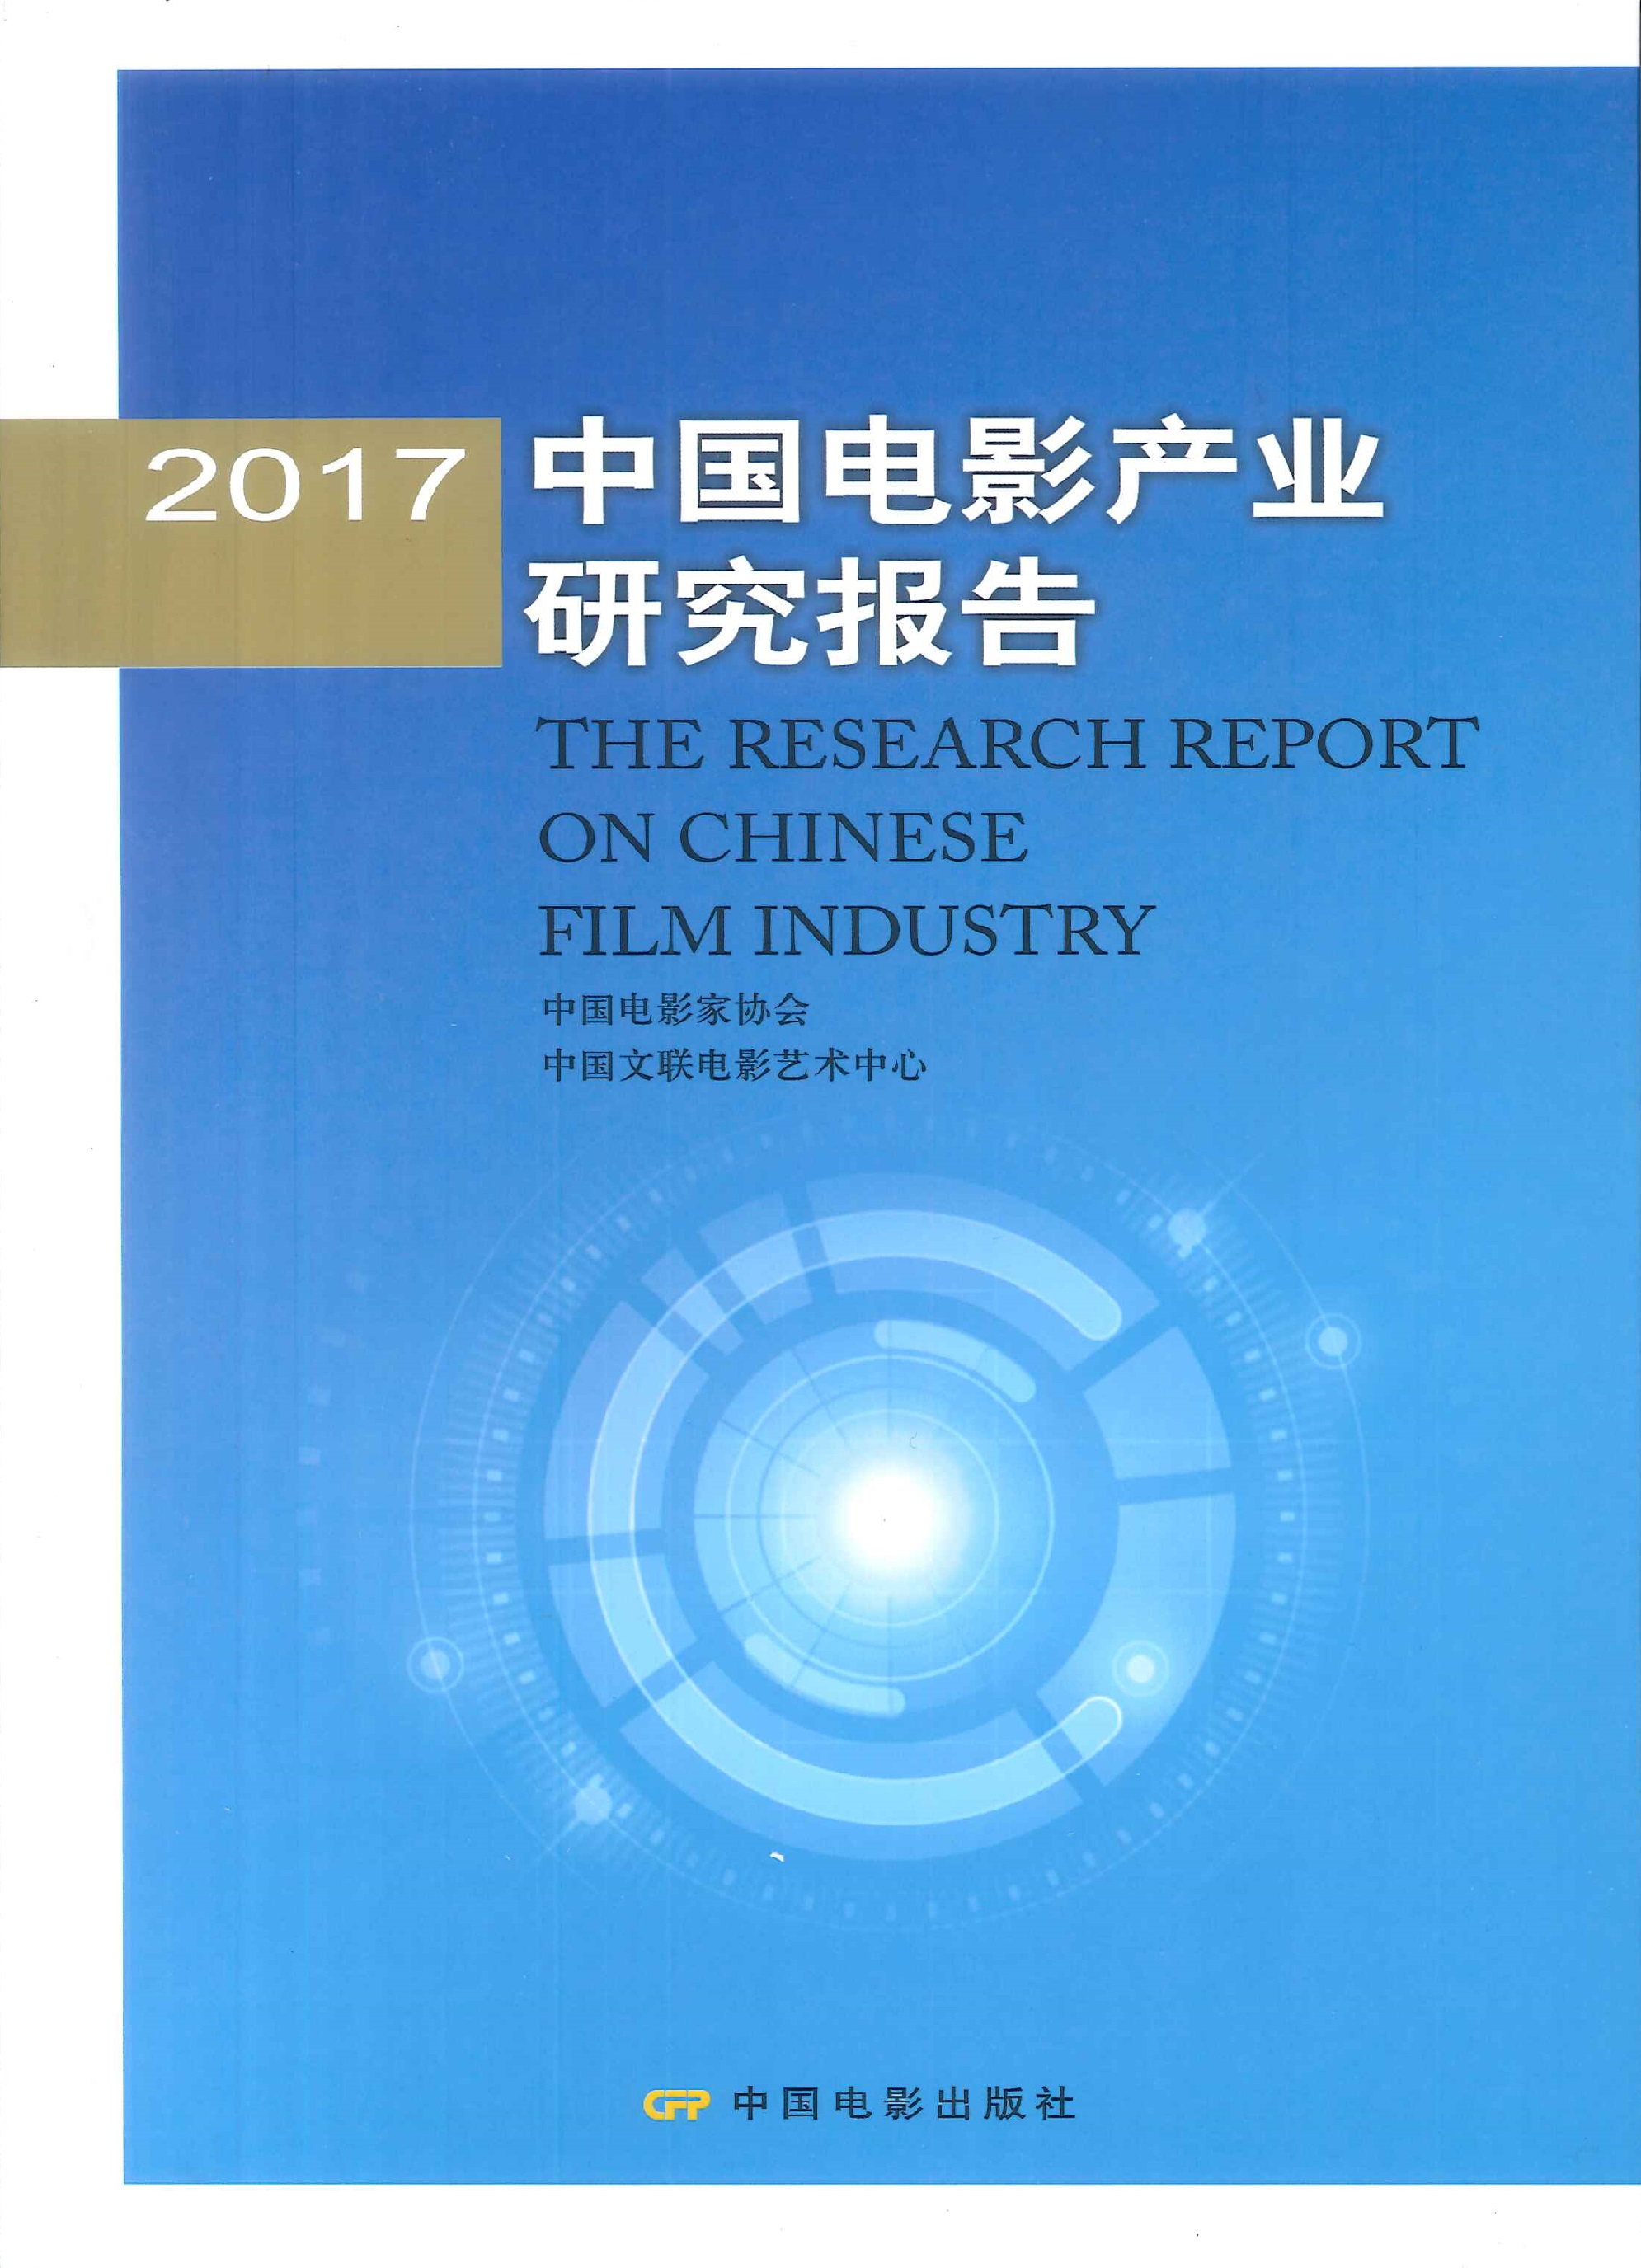 中国电影产业研究报告=The research report on Chinese film industry